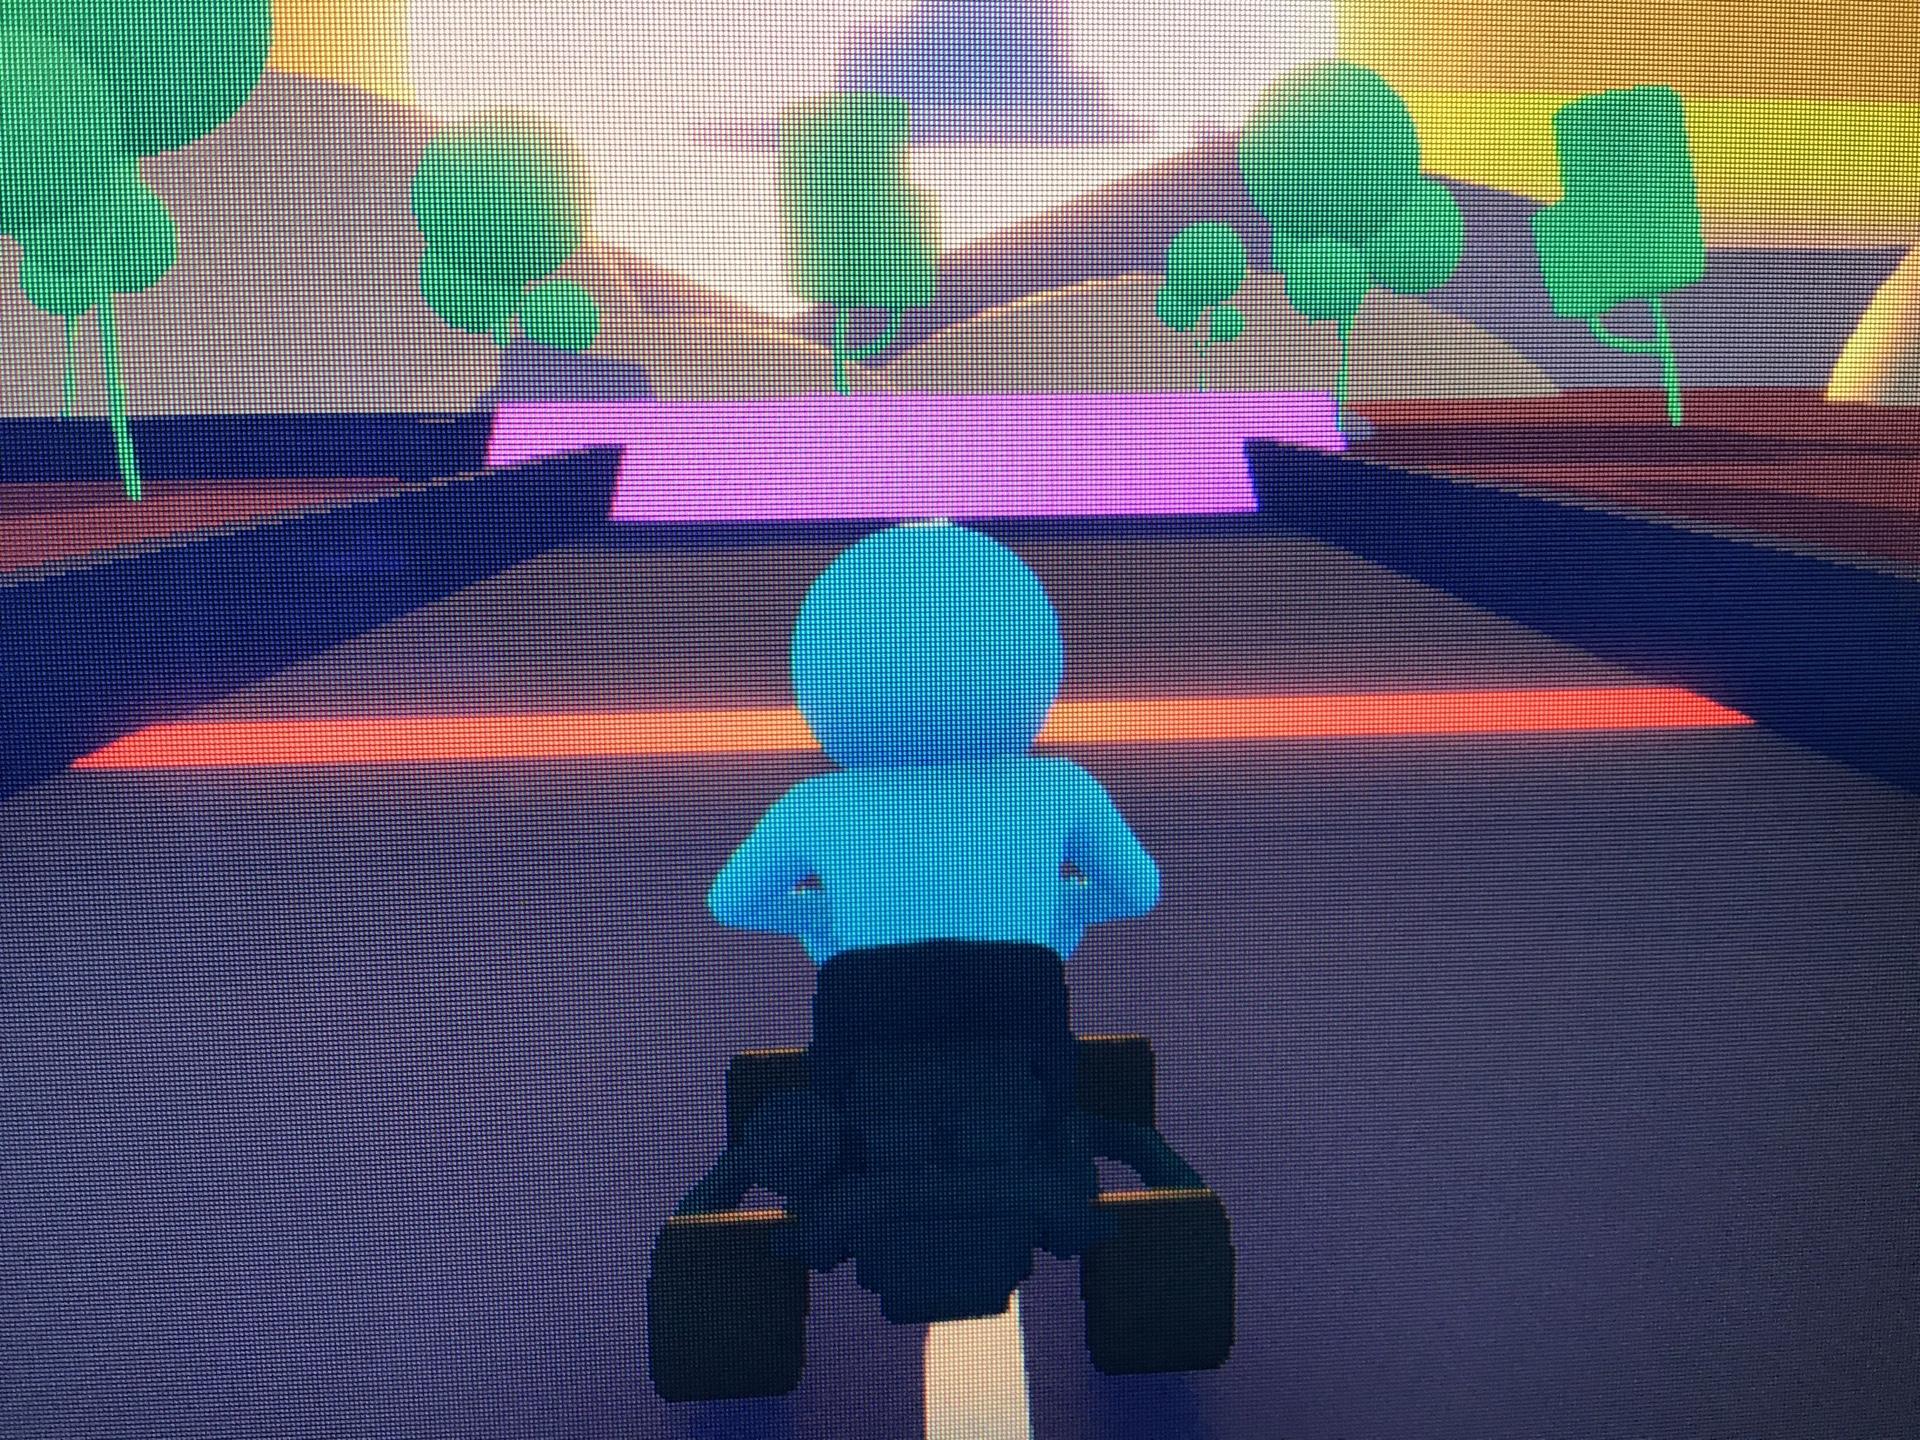 Epic Kart Race